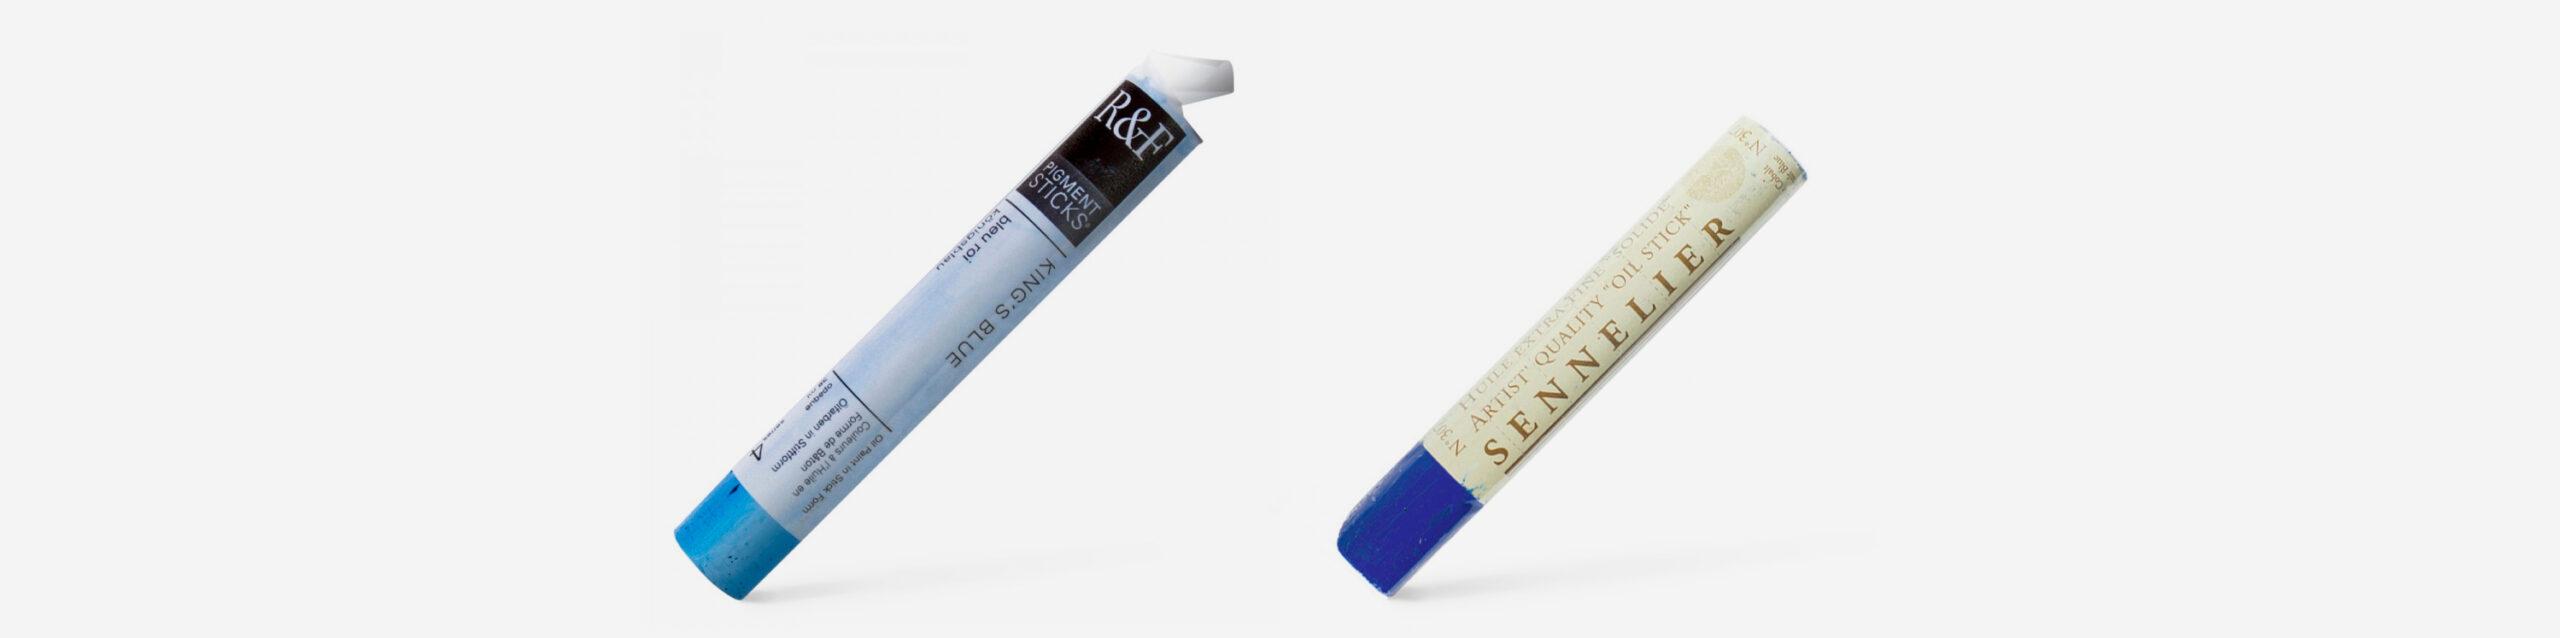 R&F Pigment Stick, Sennelier Oil Stick